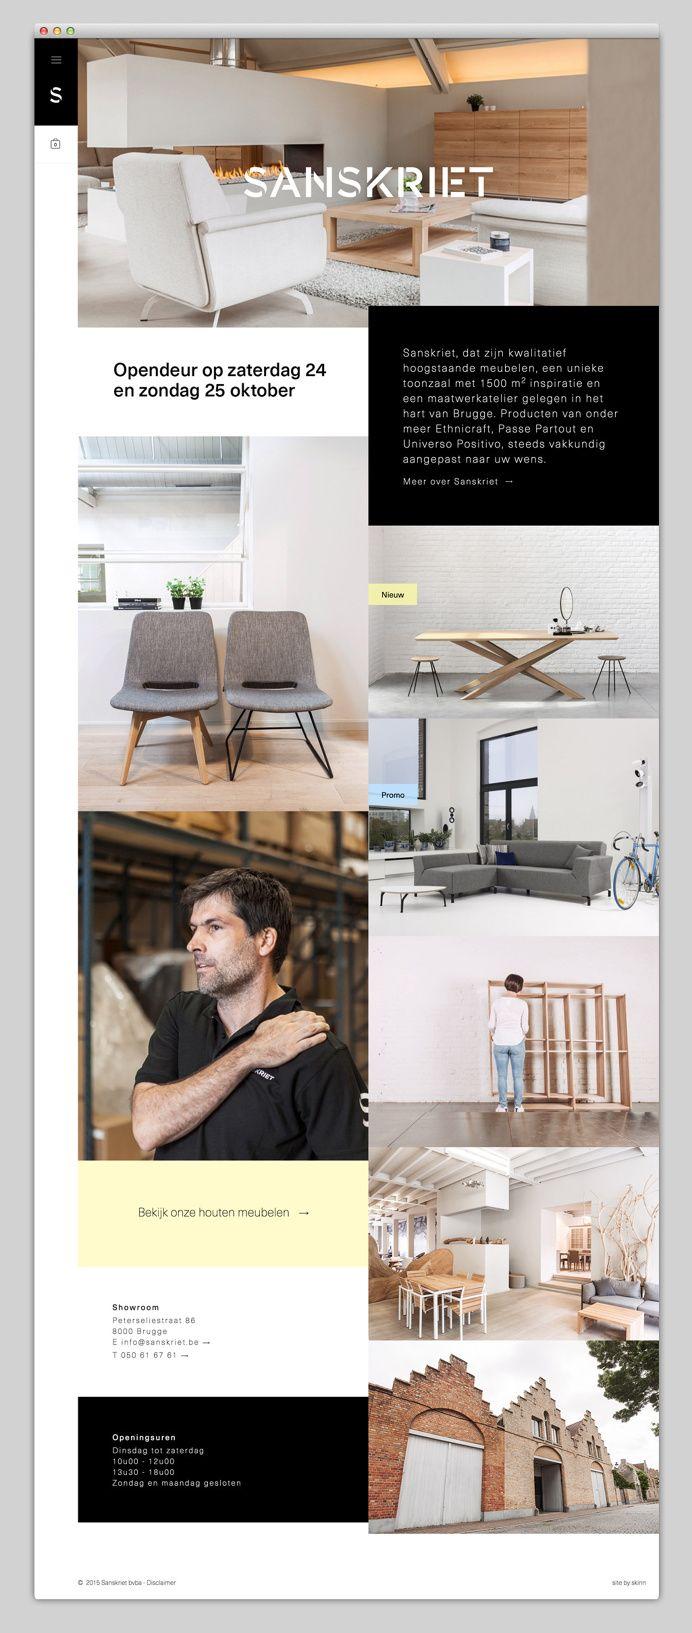 http://designspiration.net/image/2532211383544/